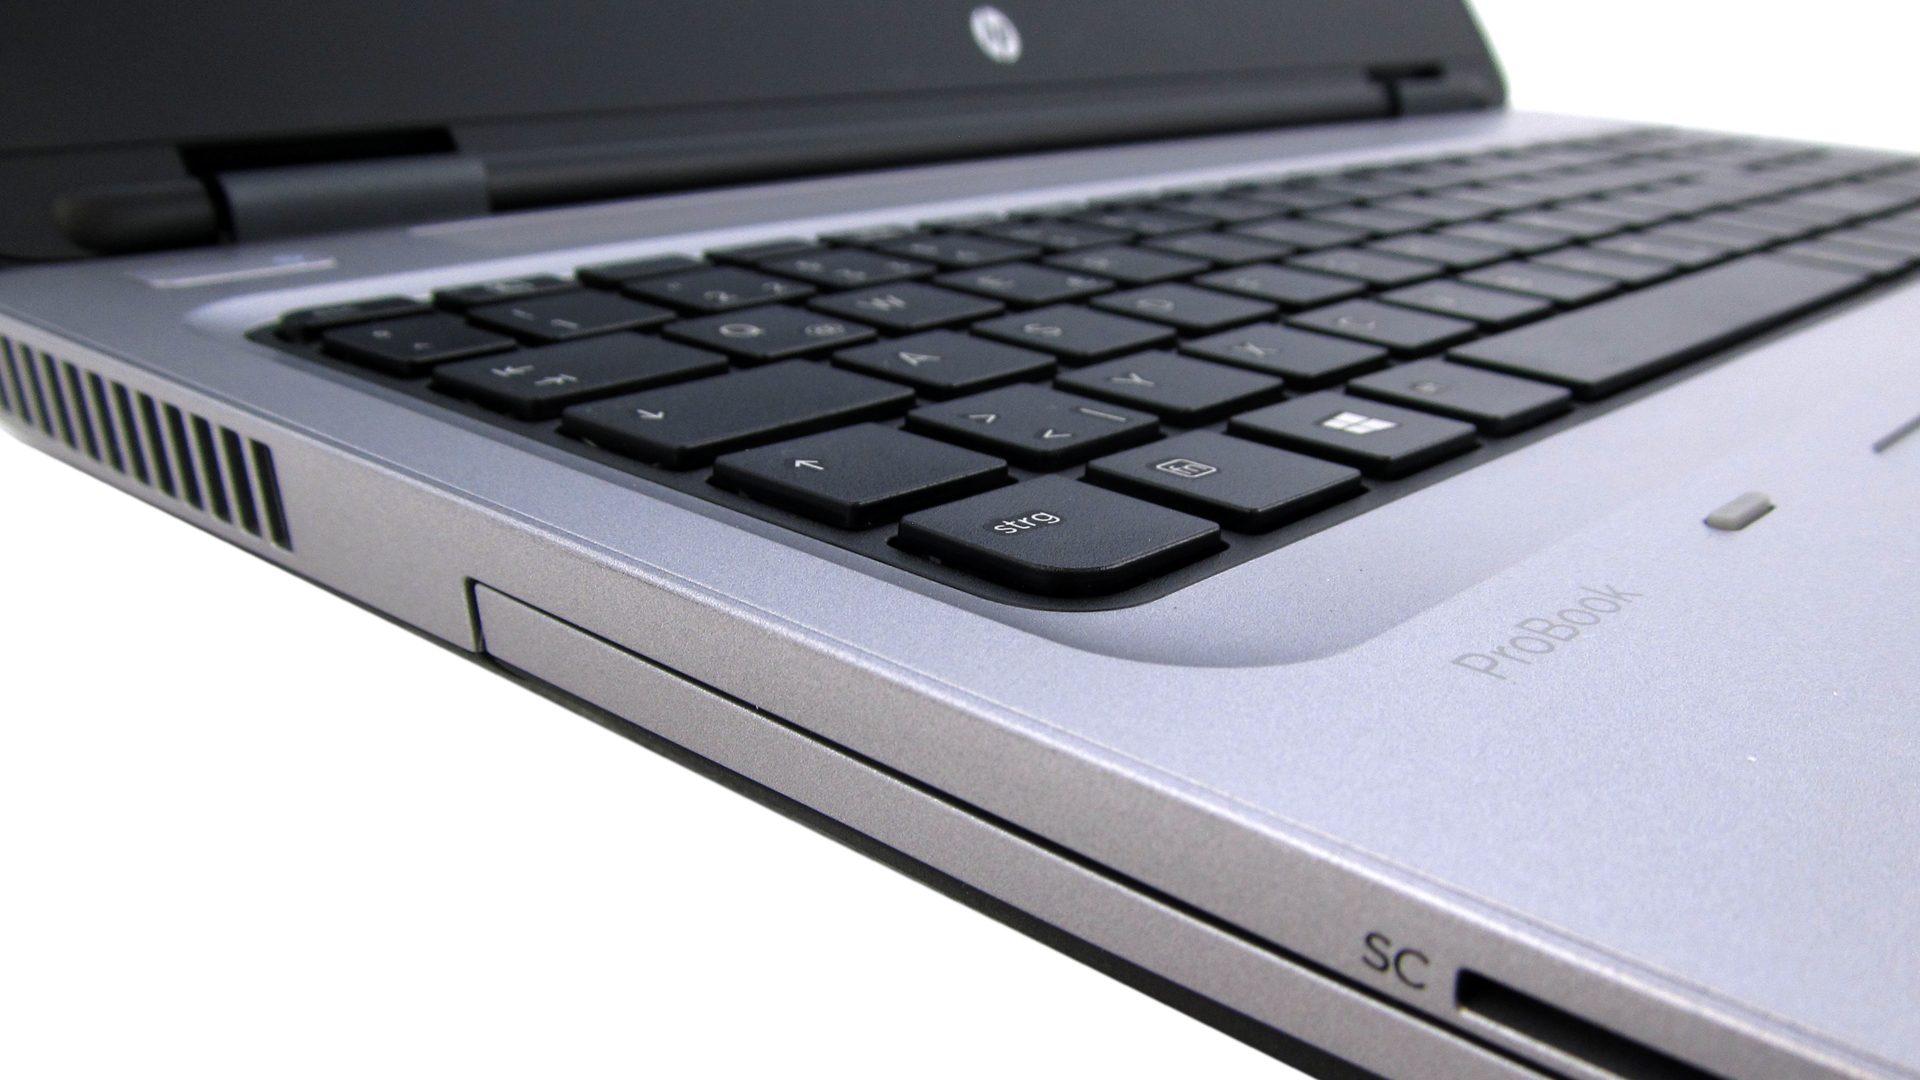 HP ProBook 650 G2 Tastatur_5